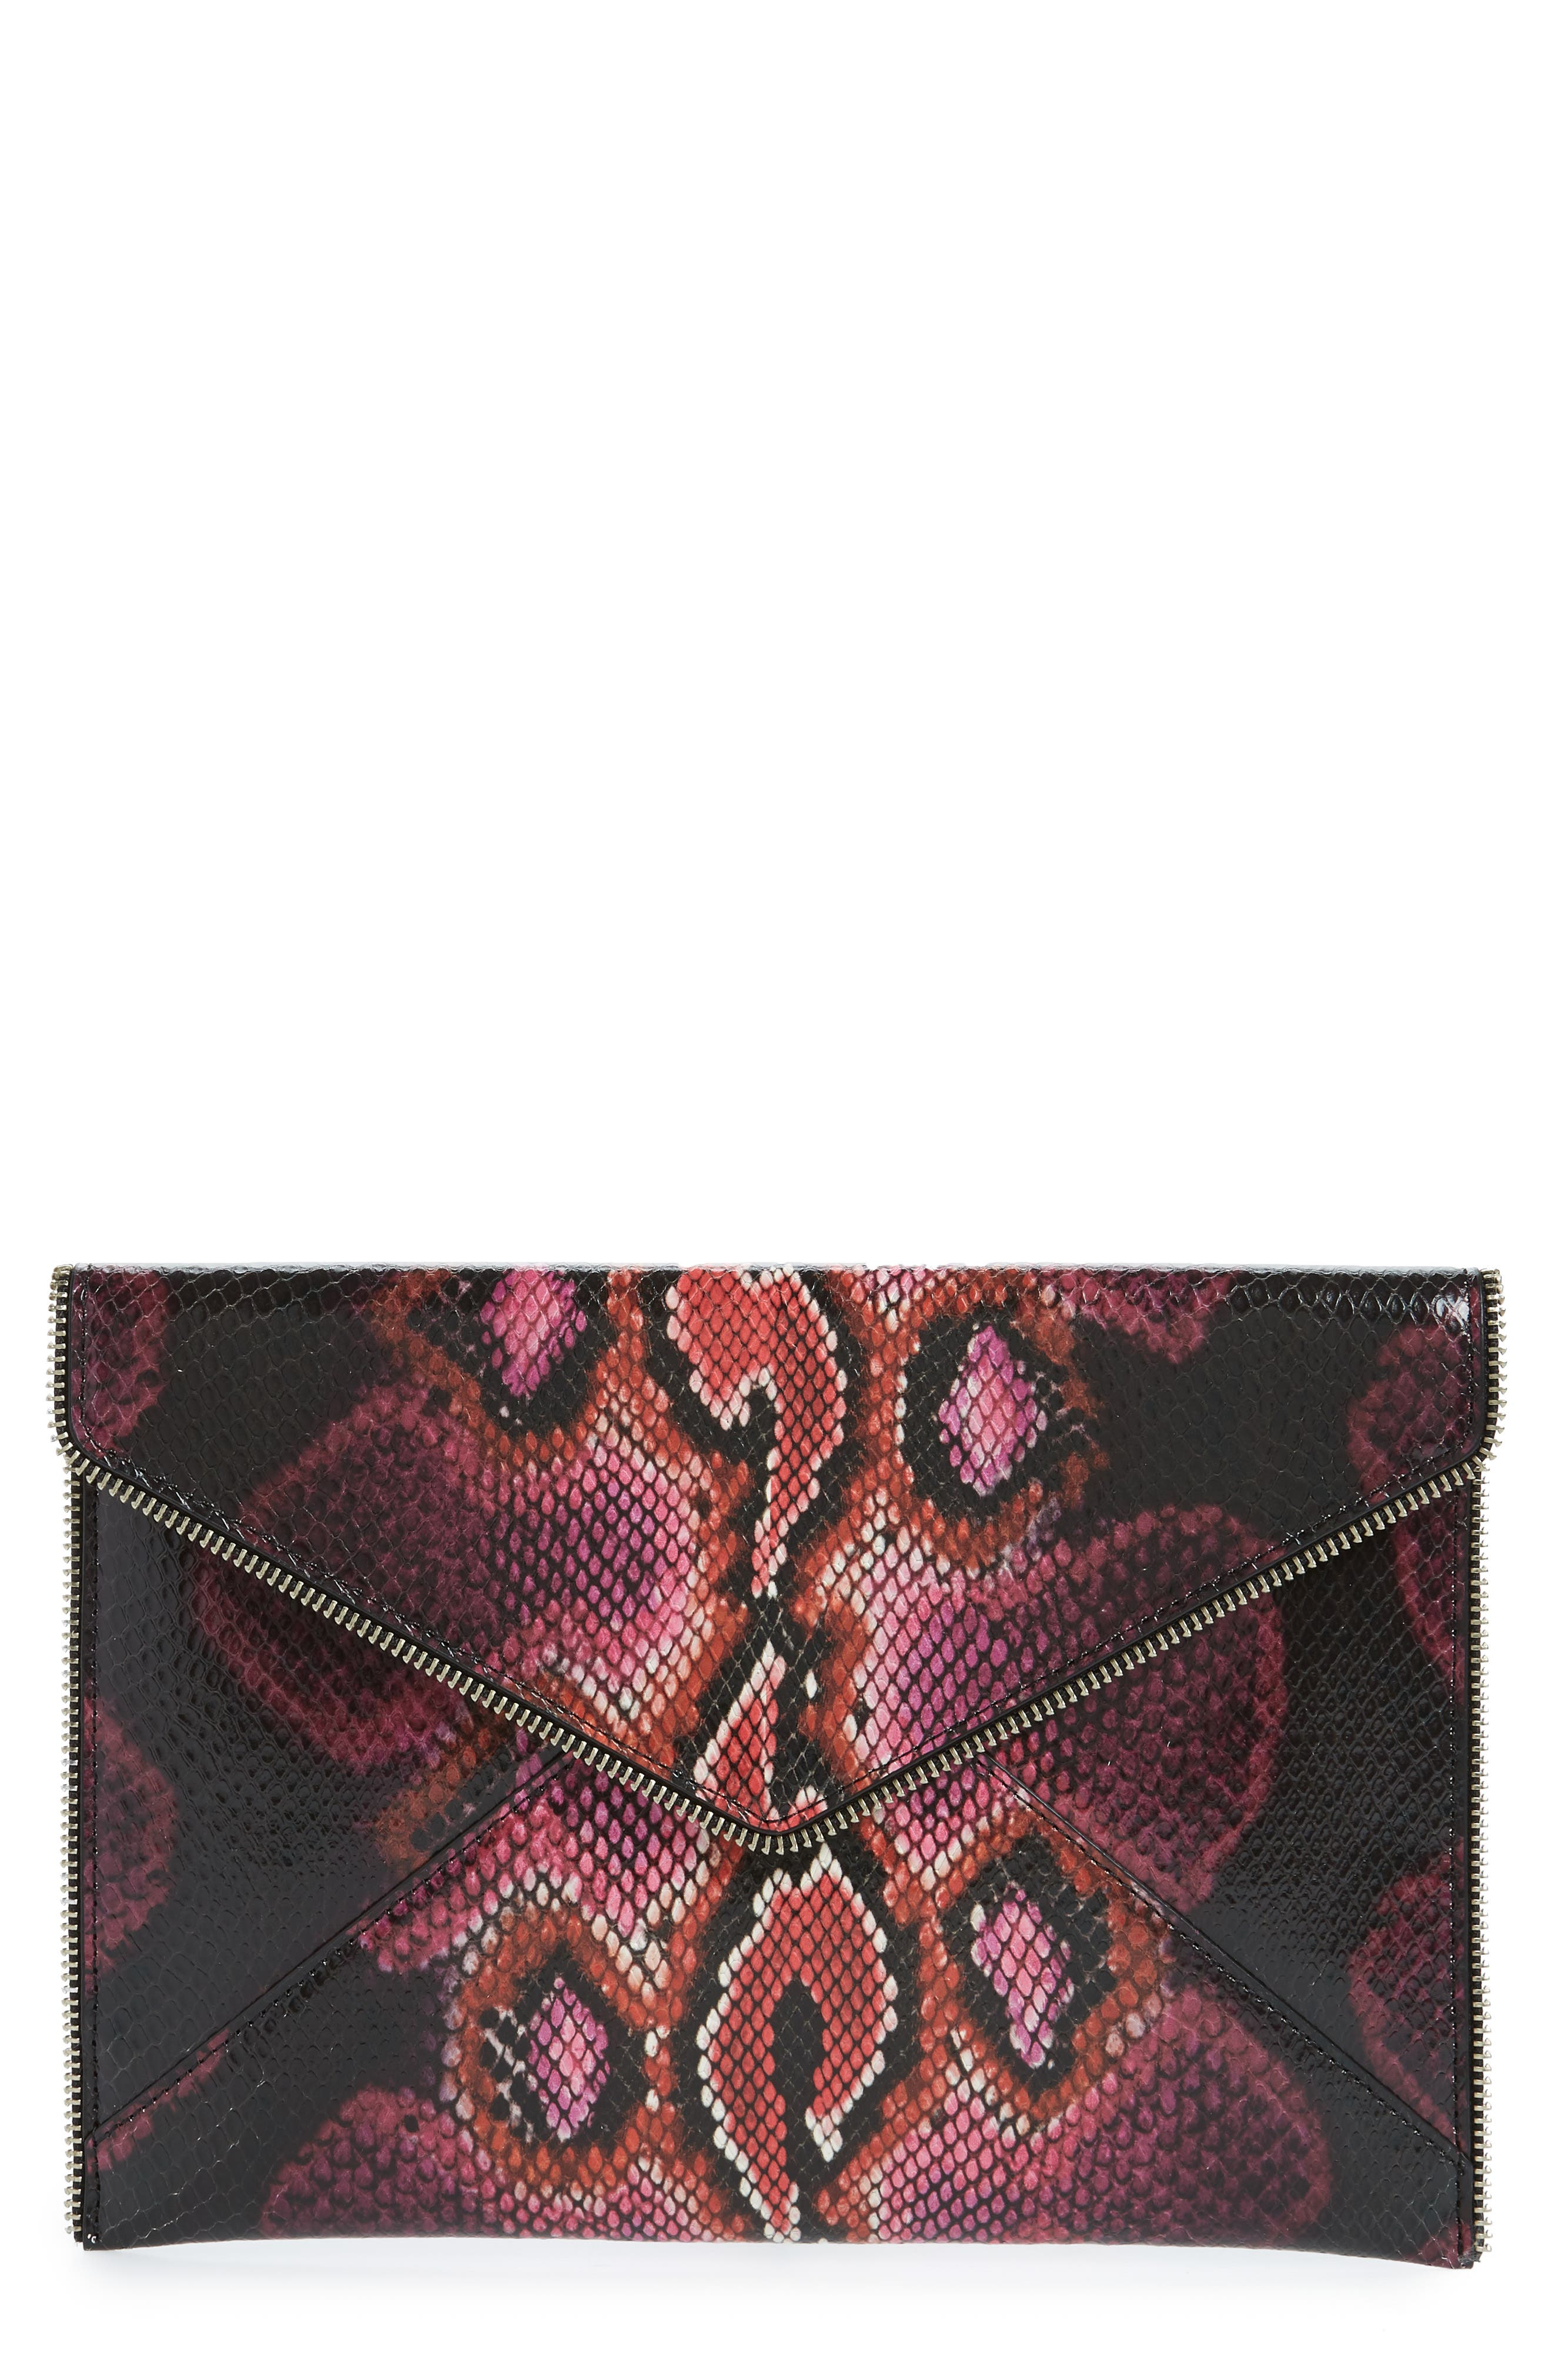 Image of Rebecca Minkoff Leo Snakeskin Embossed Leather Envelope Clutch